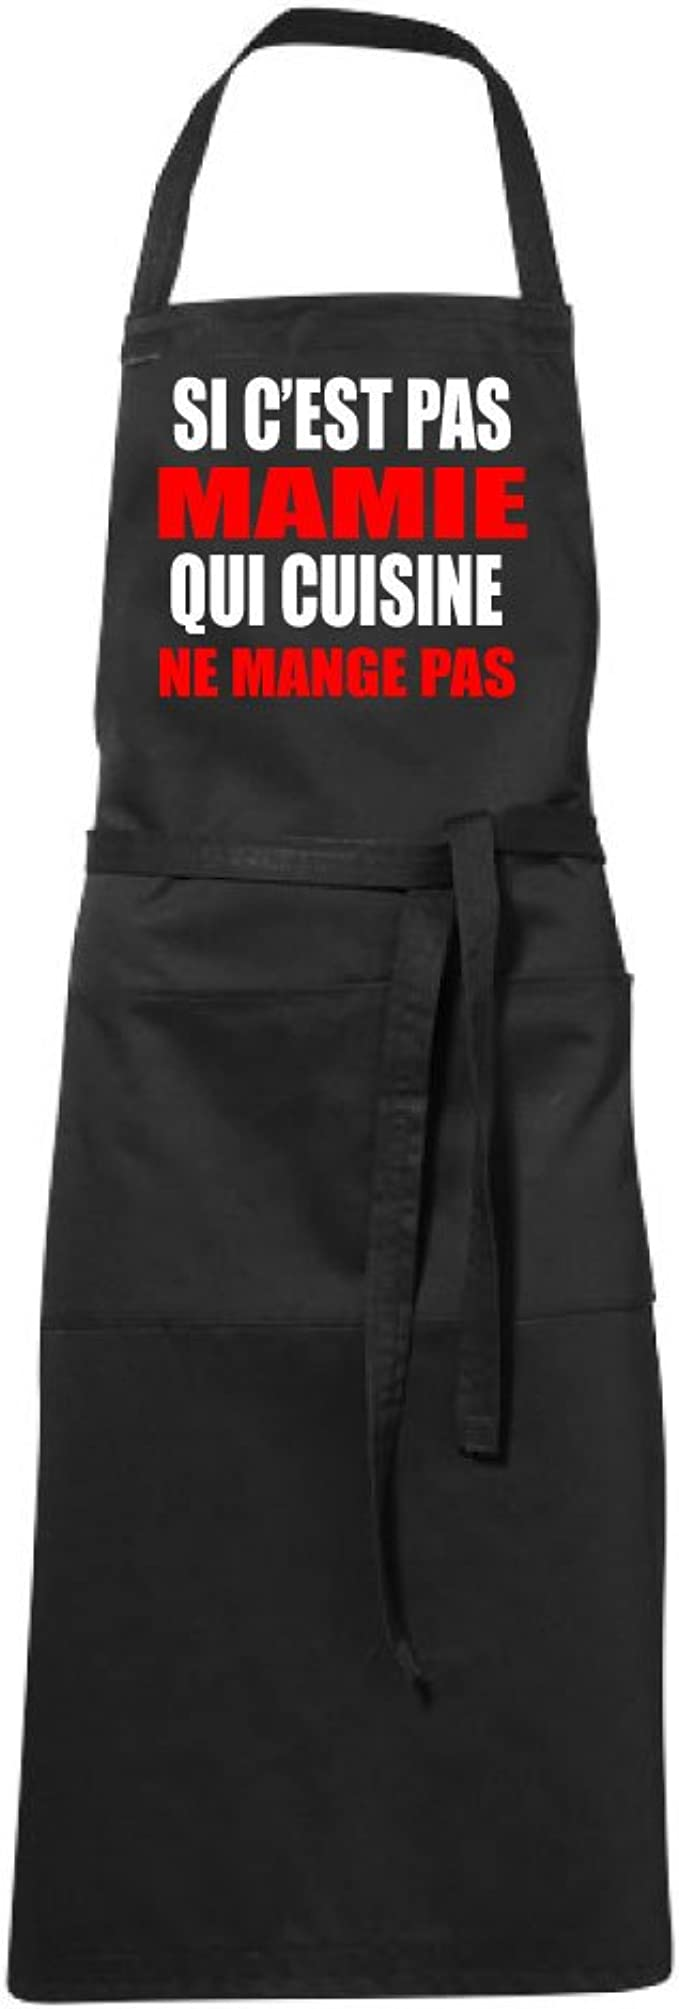 Edward Sinclair Meilleure Mamie du Monde//Cuisine//Tablier